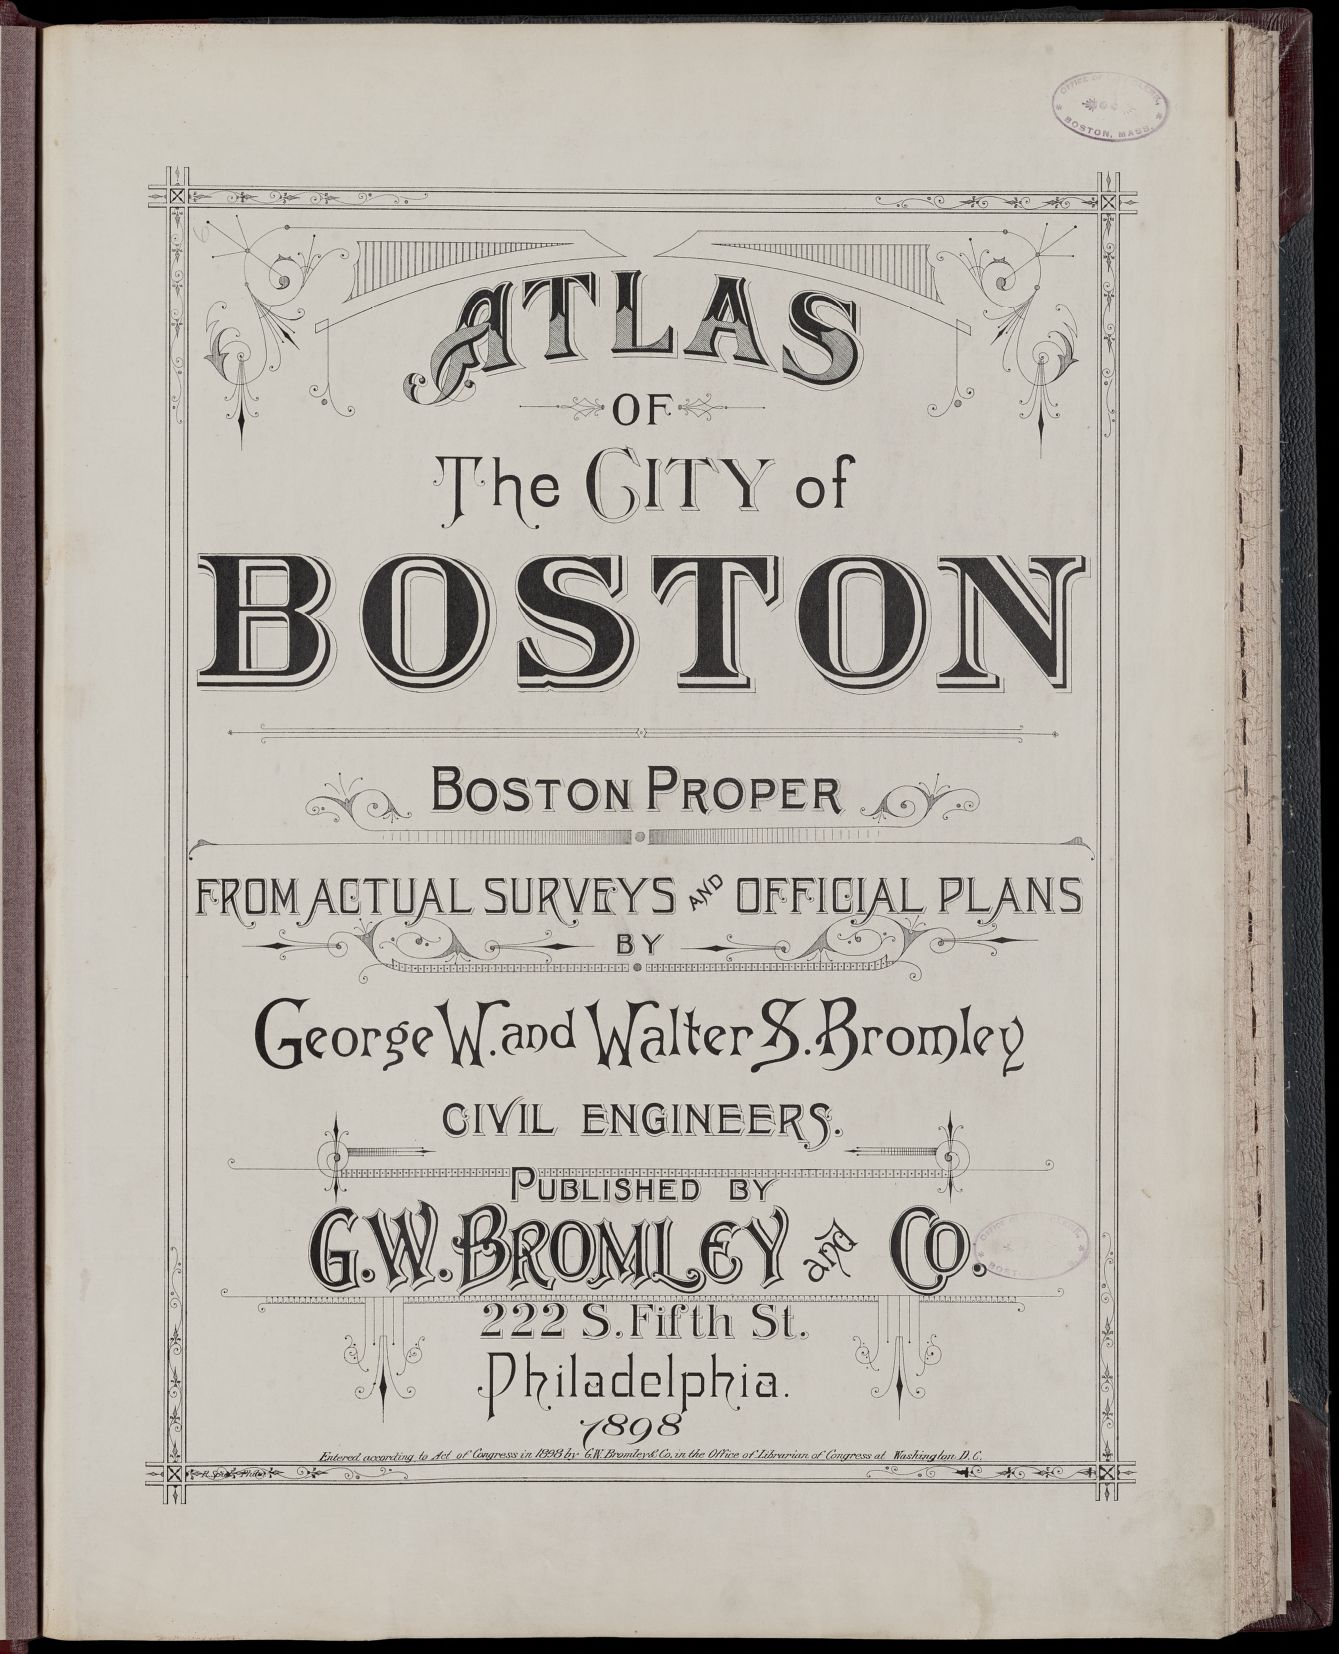 Atlas of the city of Boston : Boston proper